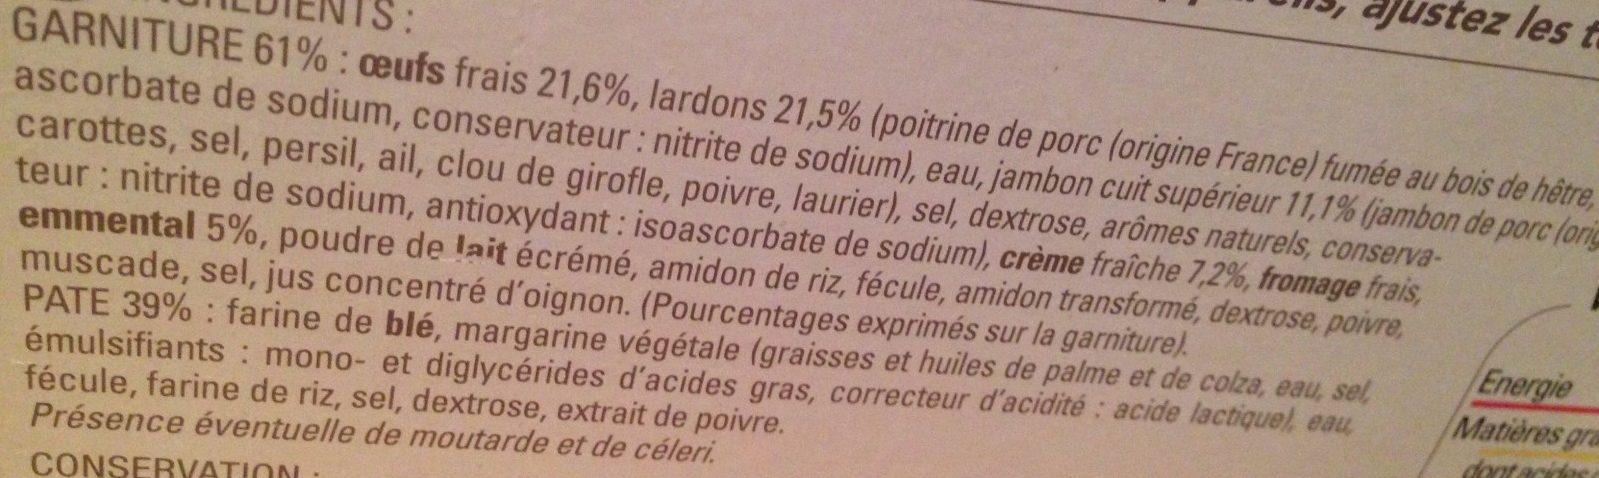 12 Quiches Lorraines - Ingrédients